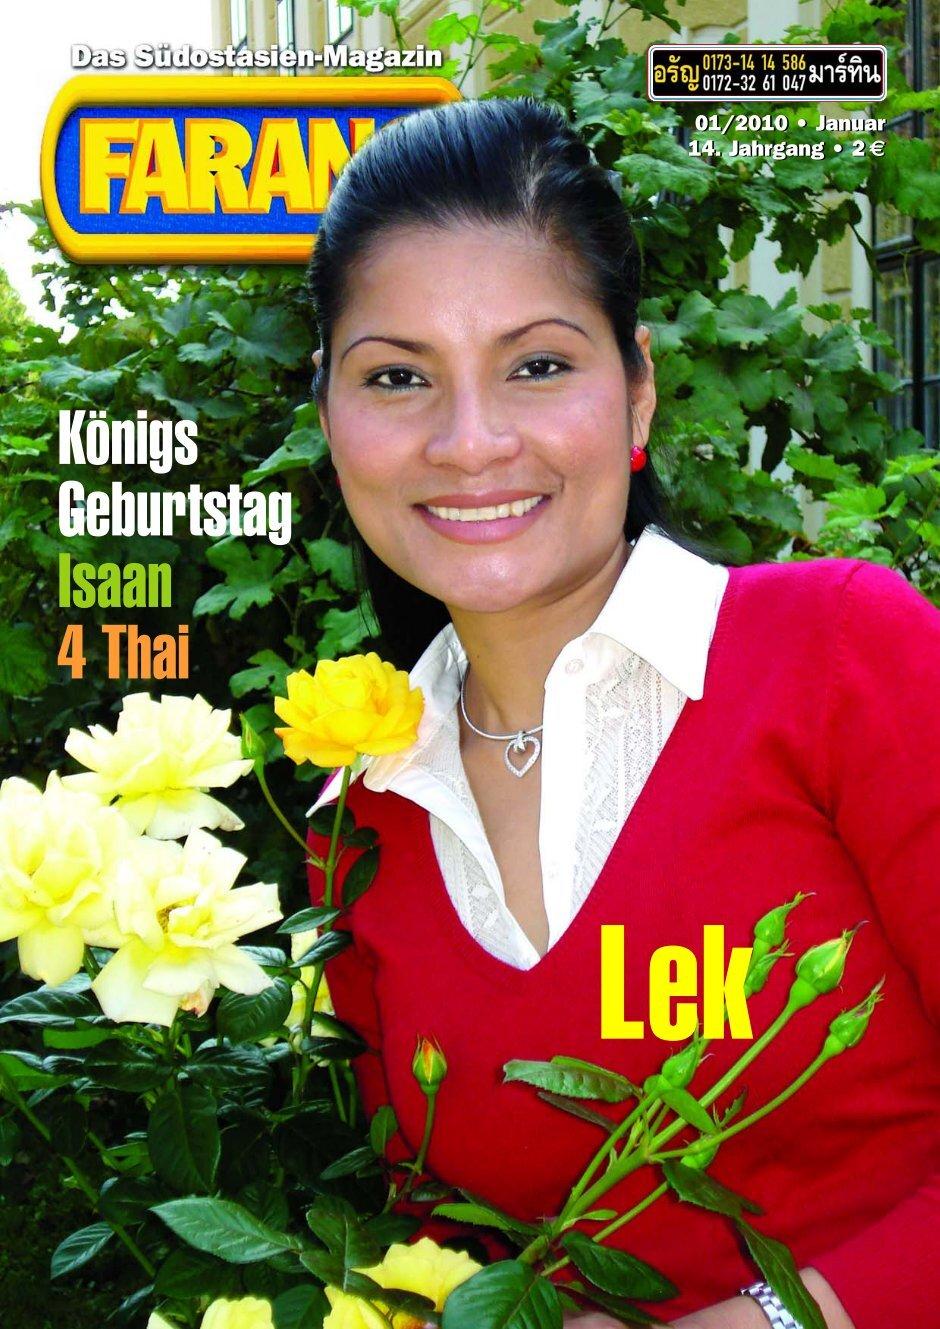 farang magazin